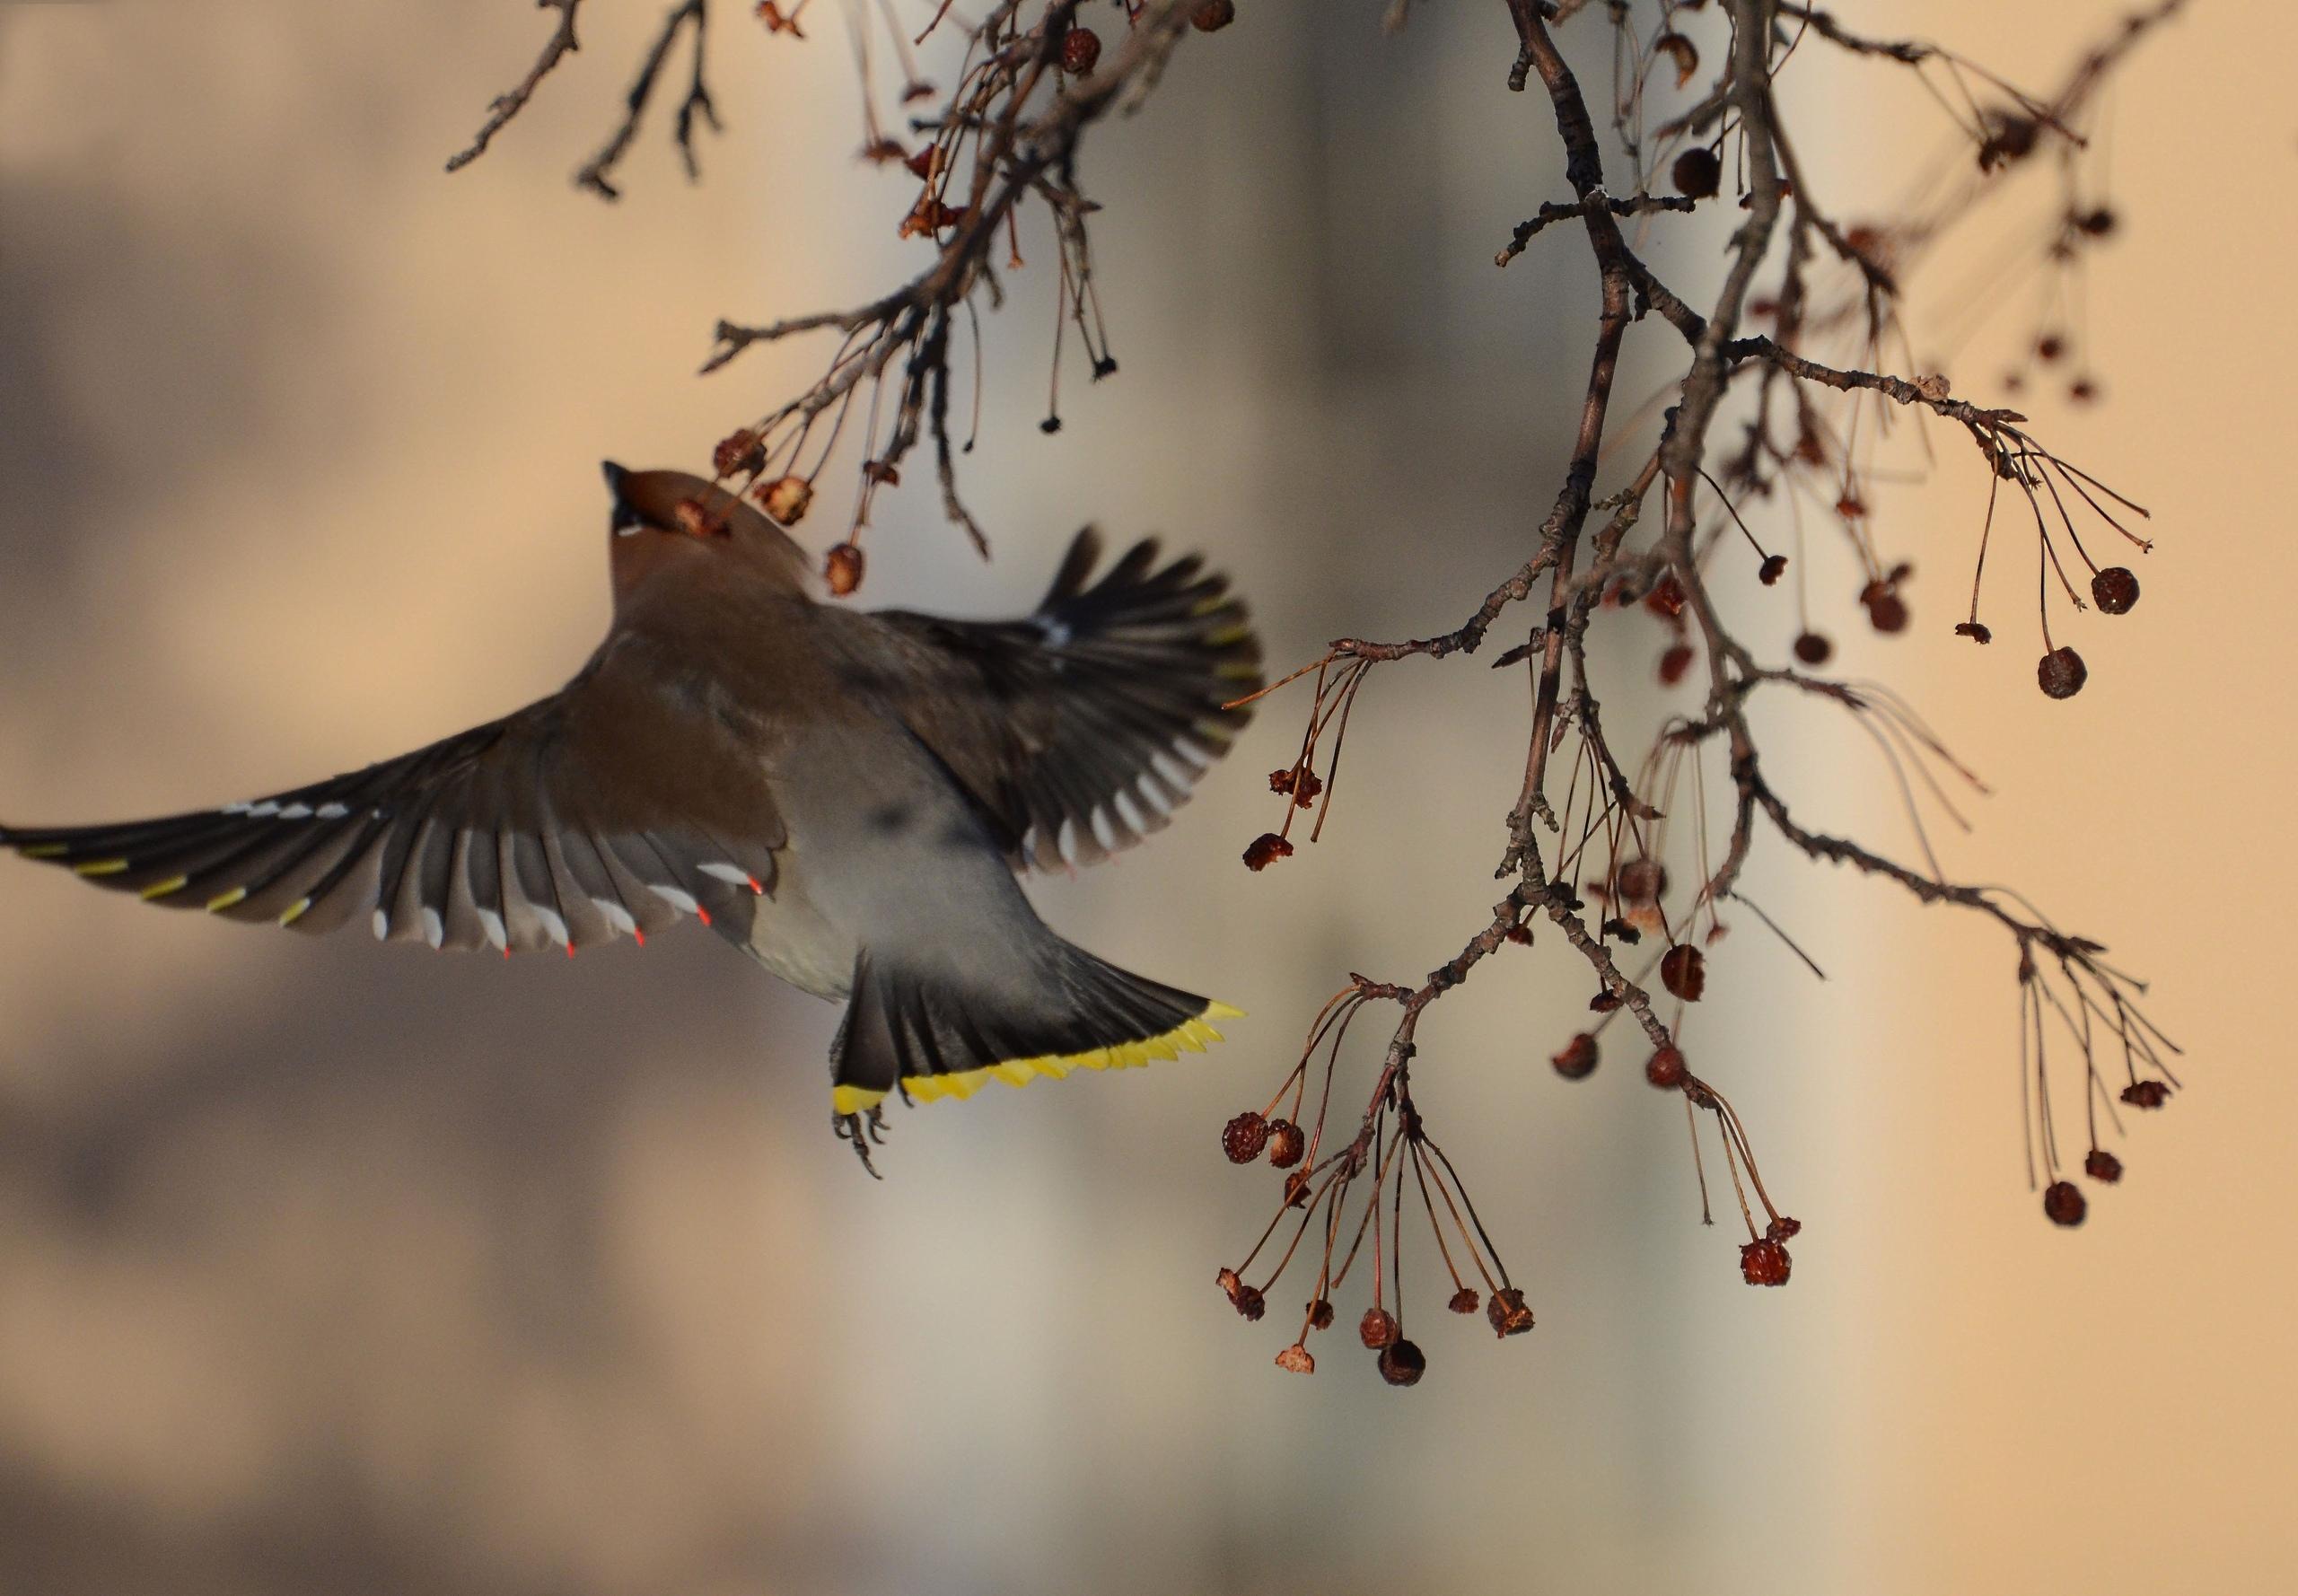 Ярких птиц со зверским аппетитом заметили в Челябинске